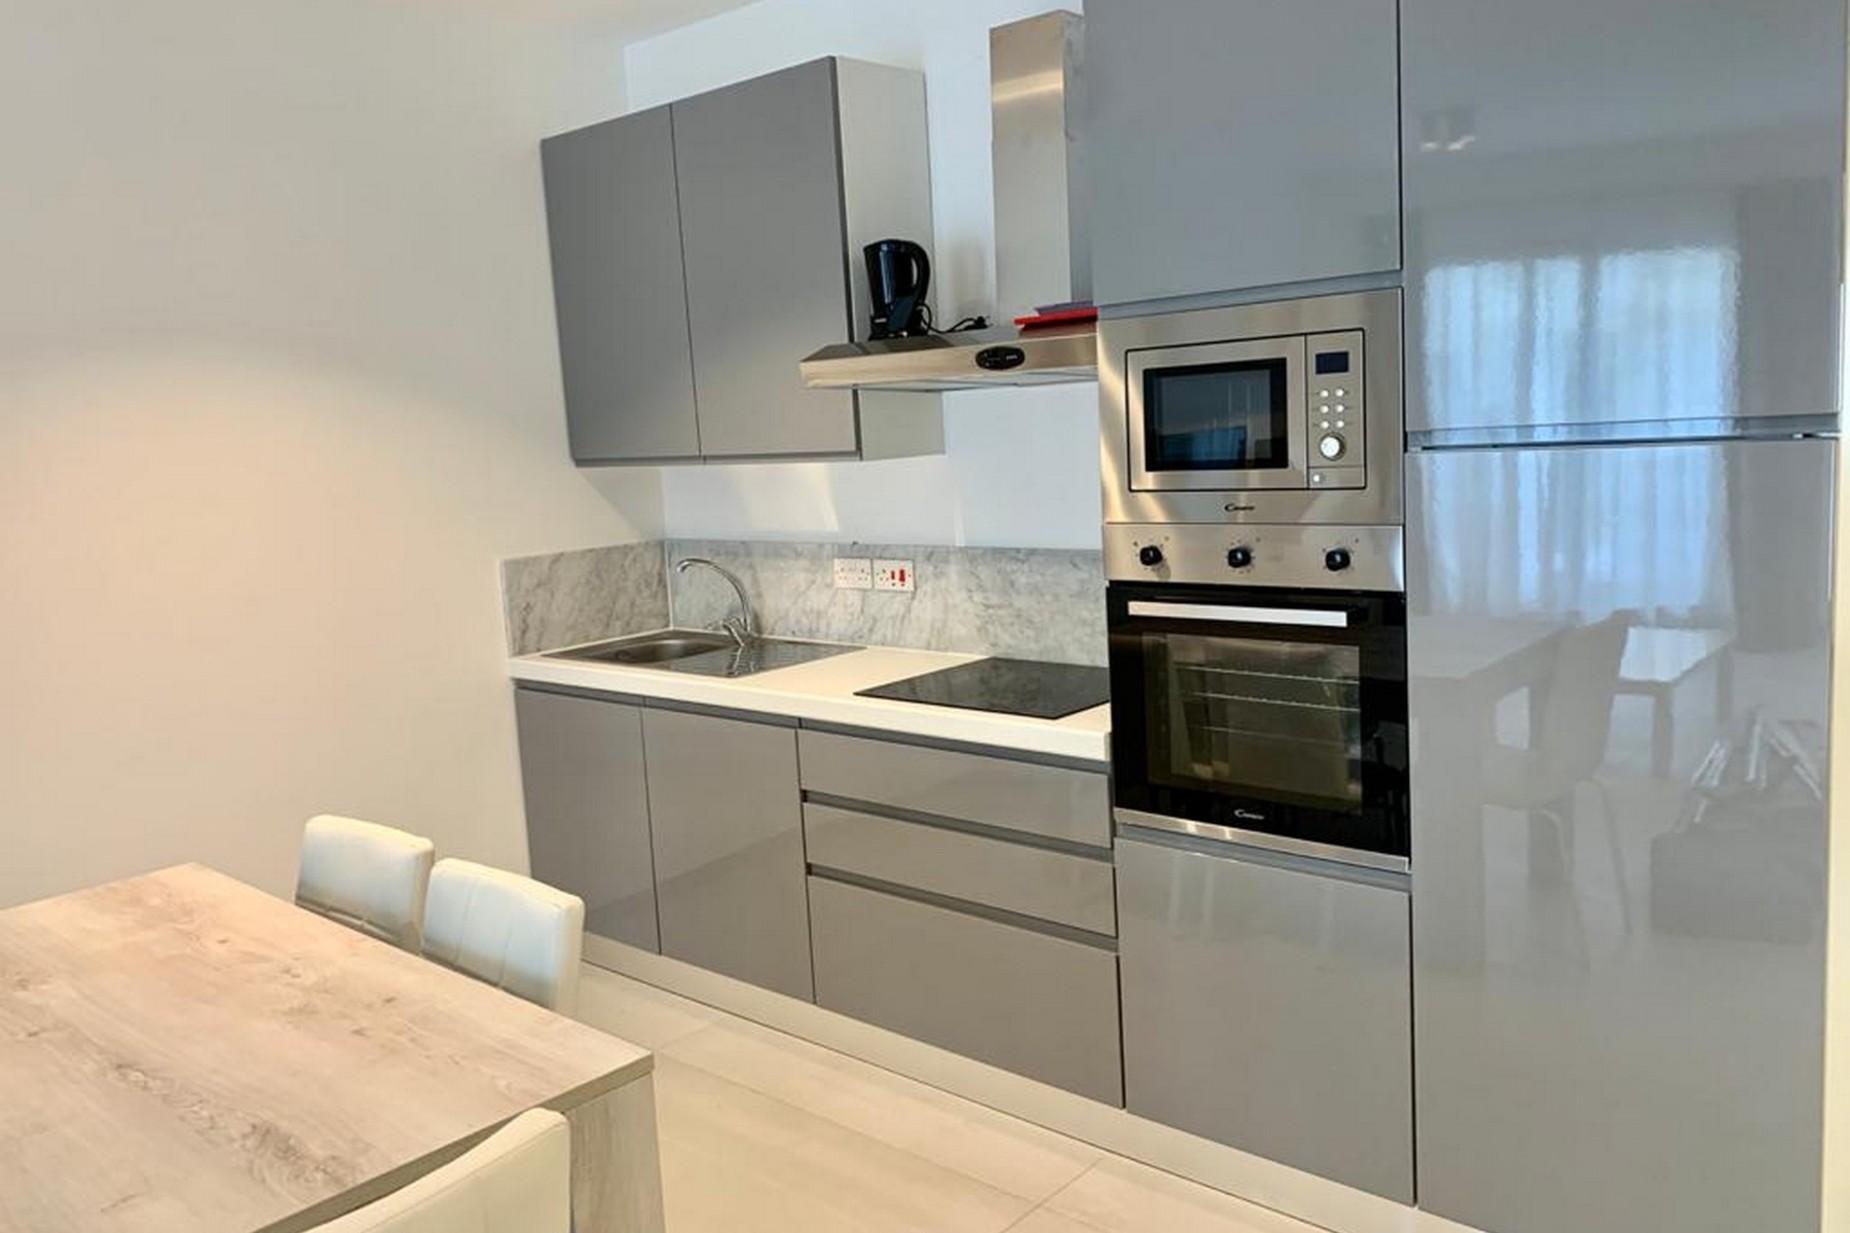 2 bed Maisonette For Rent in Swieqi, Swieqi - thumb 2